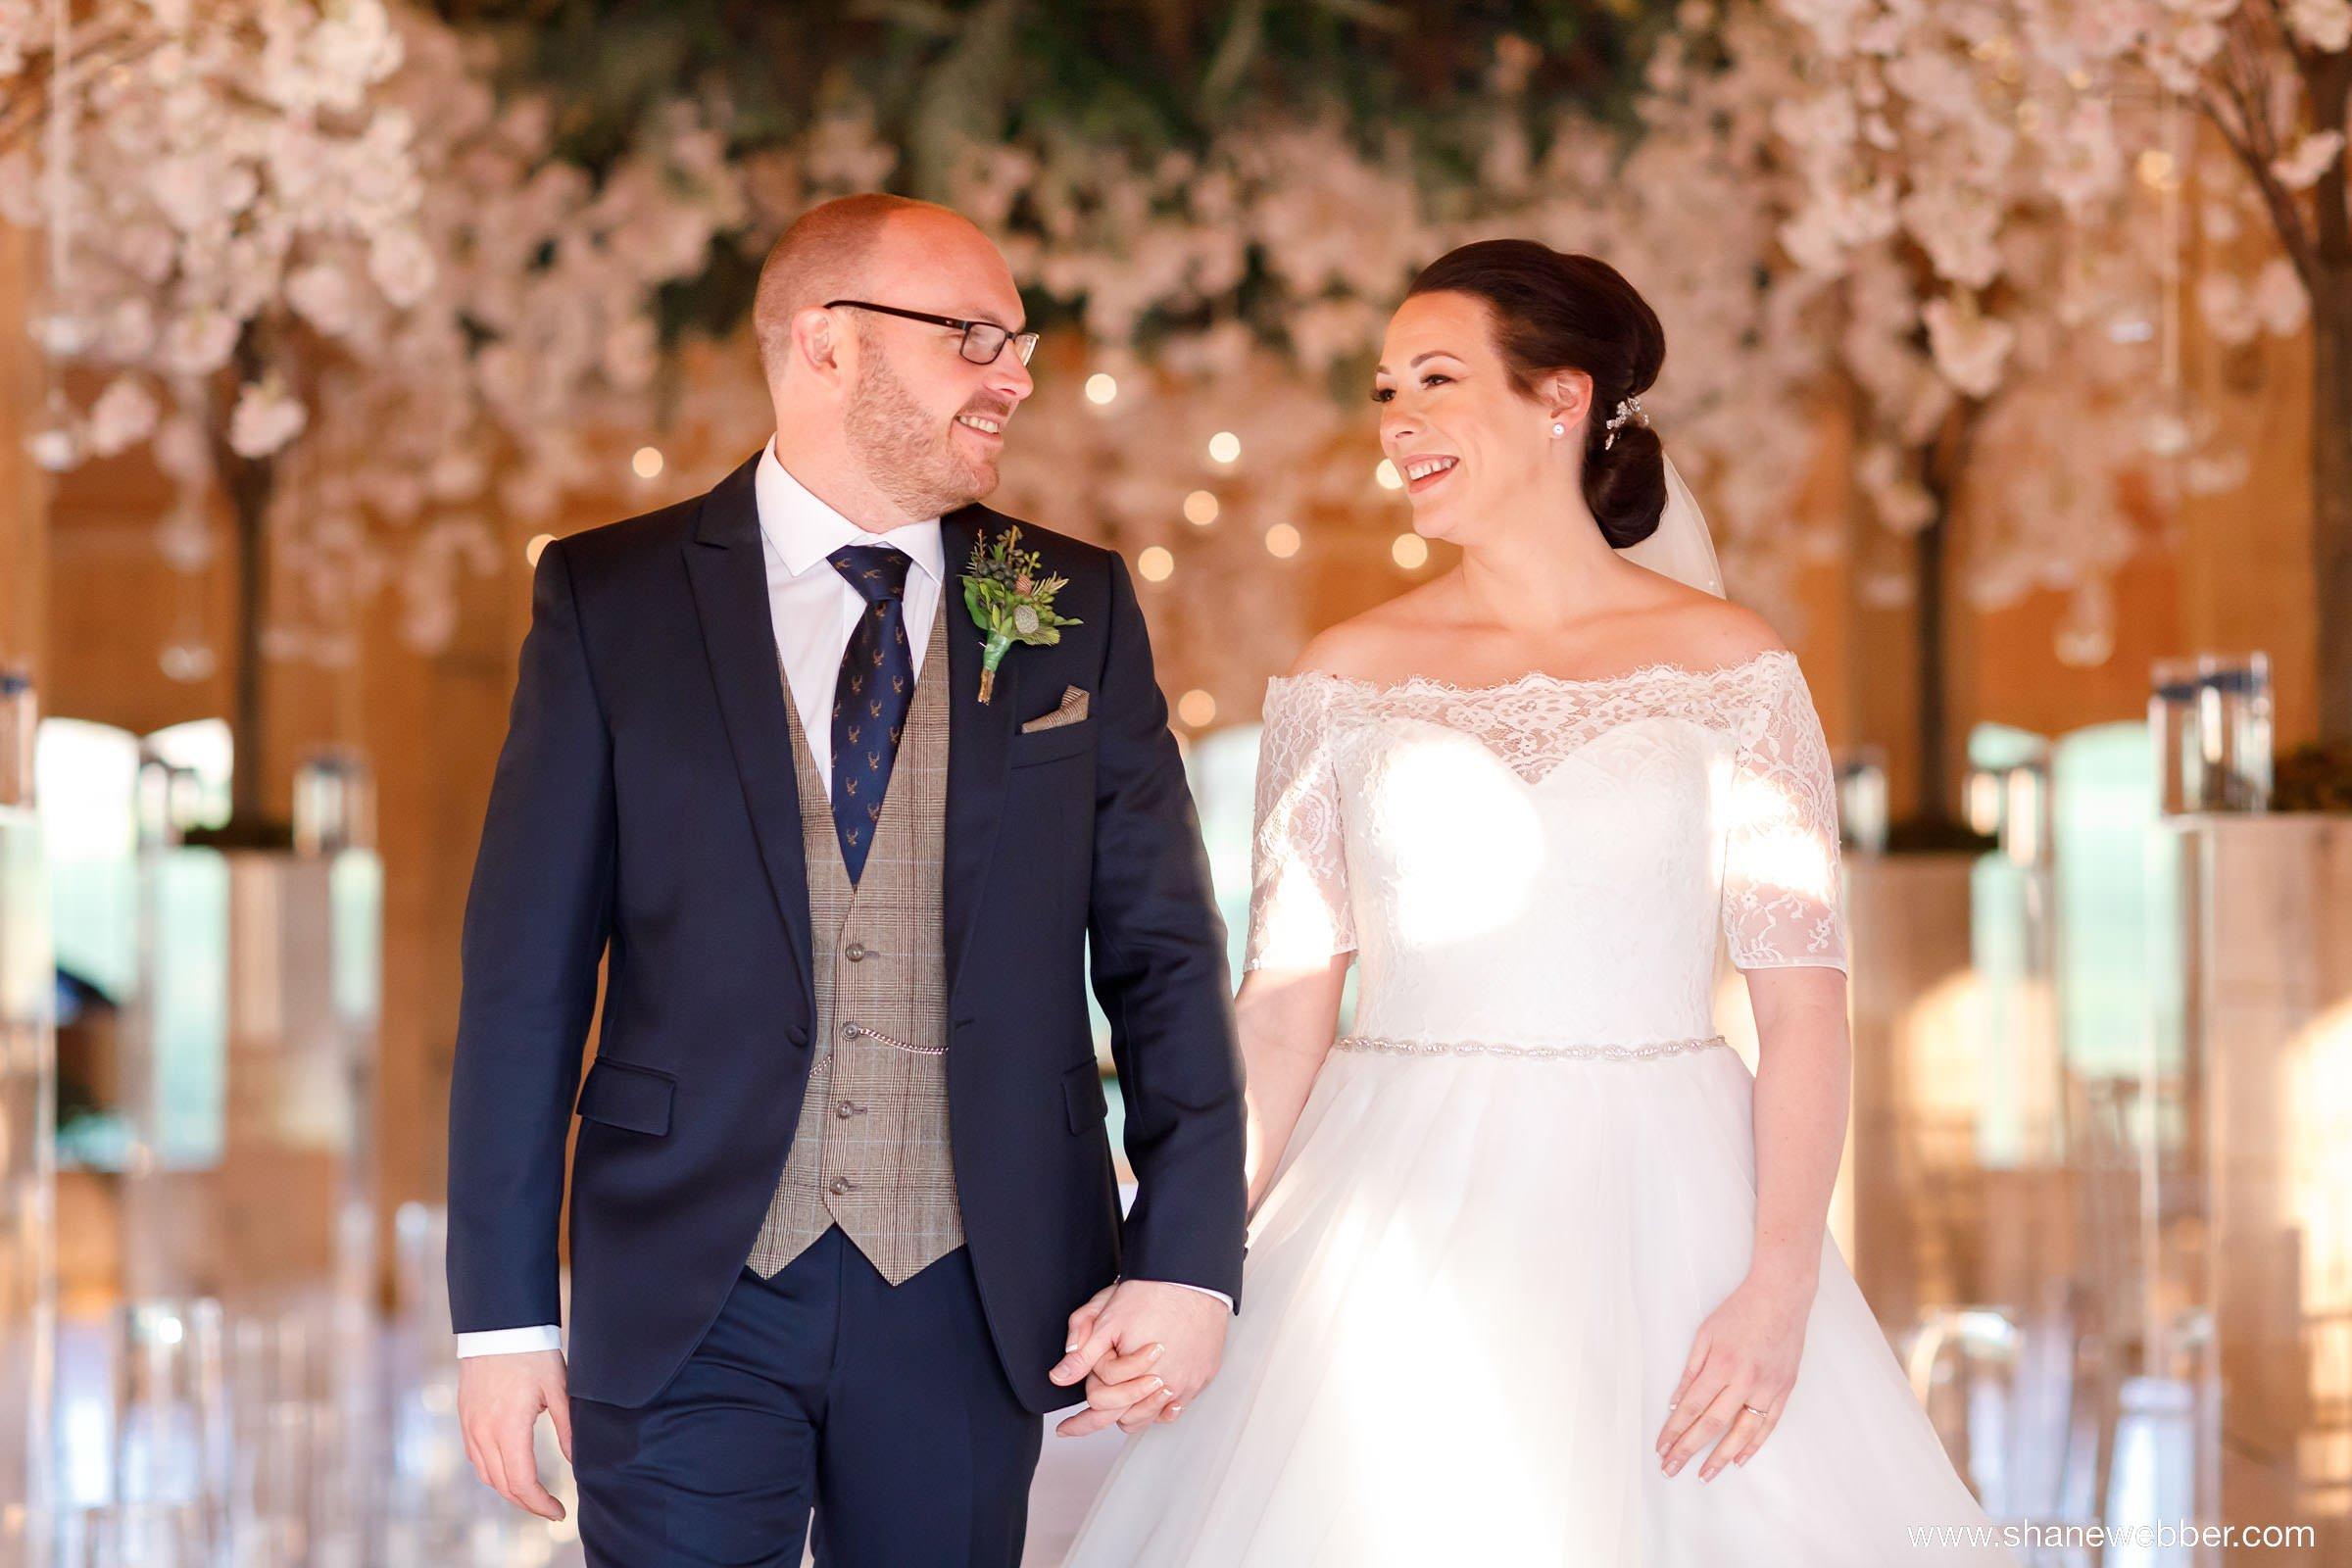 Colshaw Hall Cheshire wedding photos